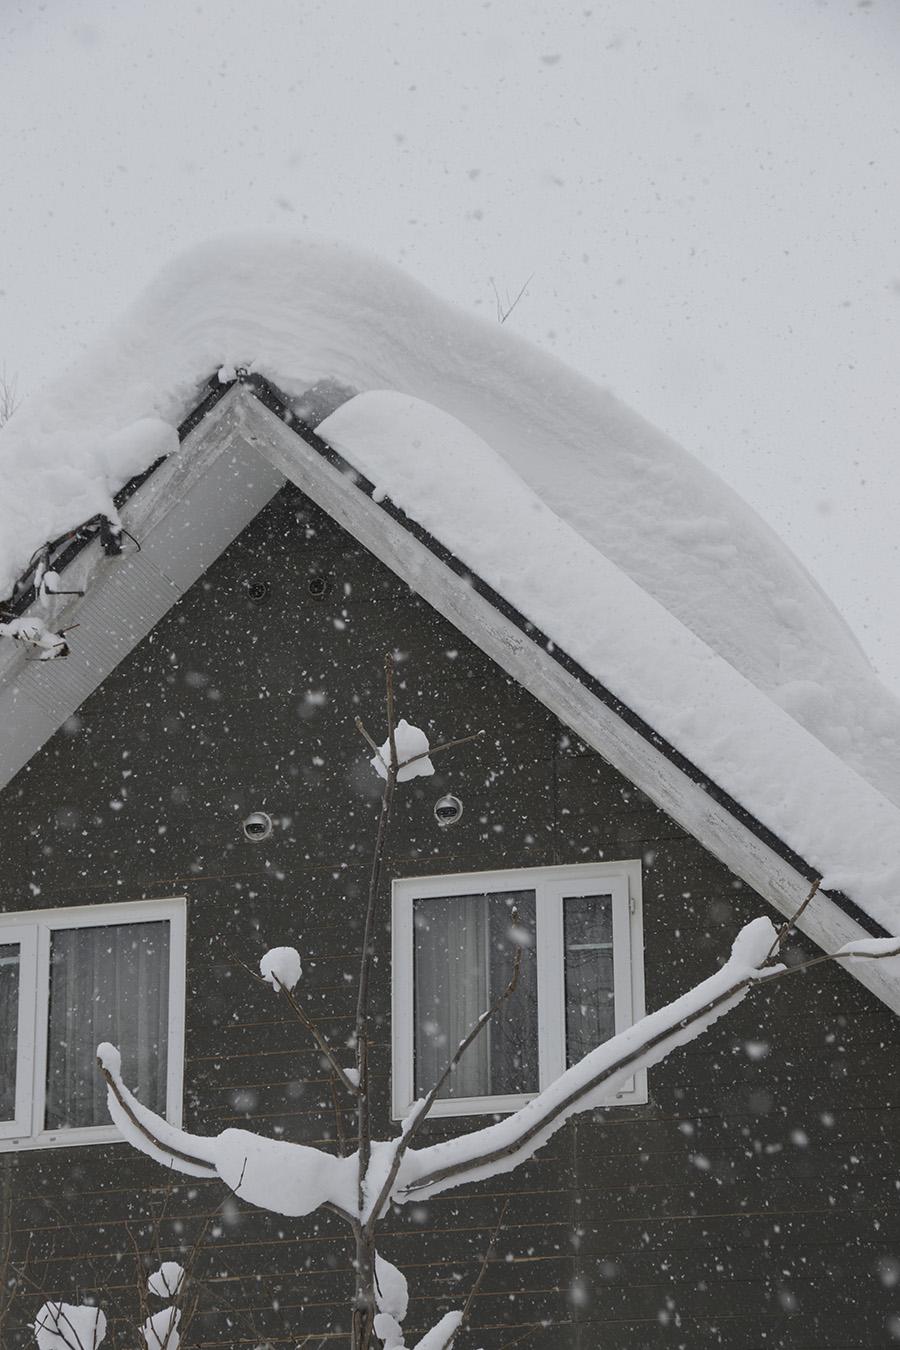 Miro in the snow